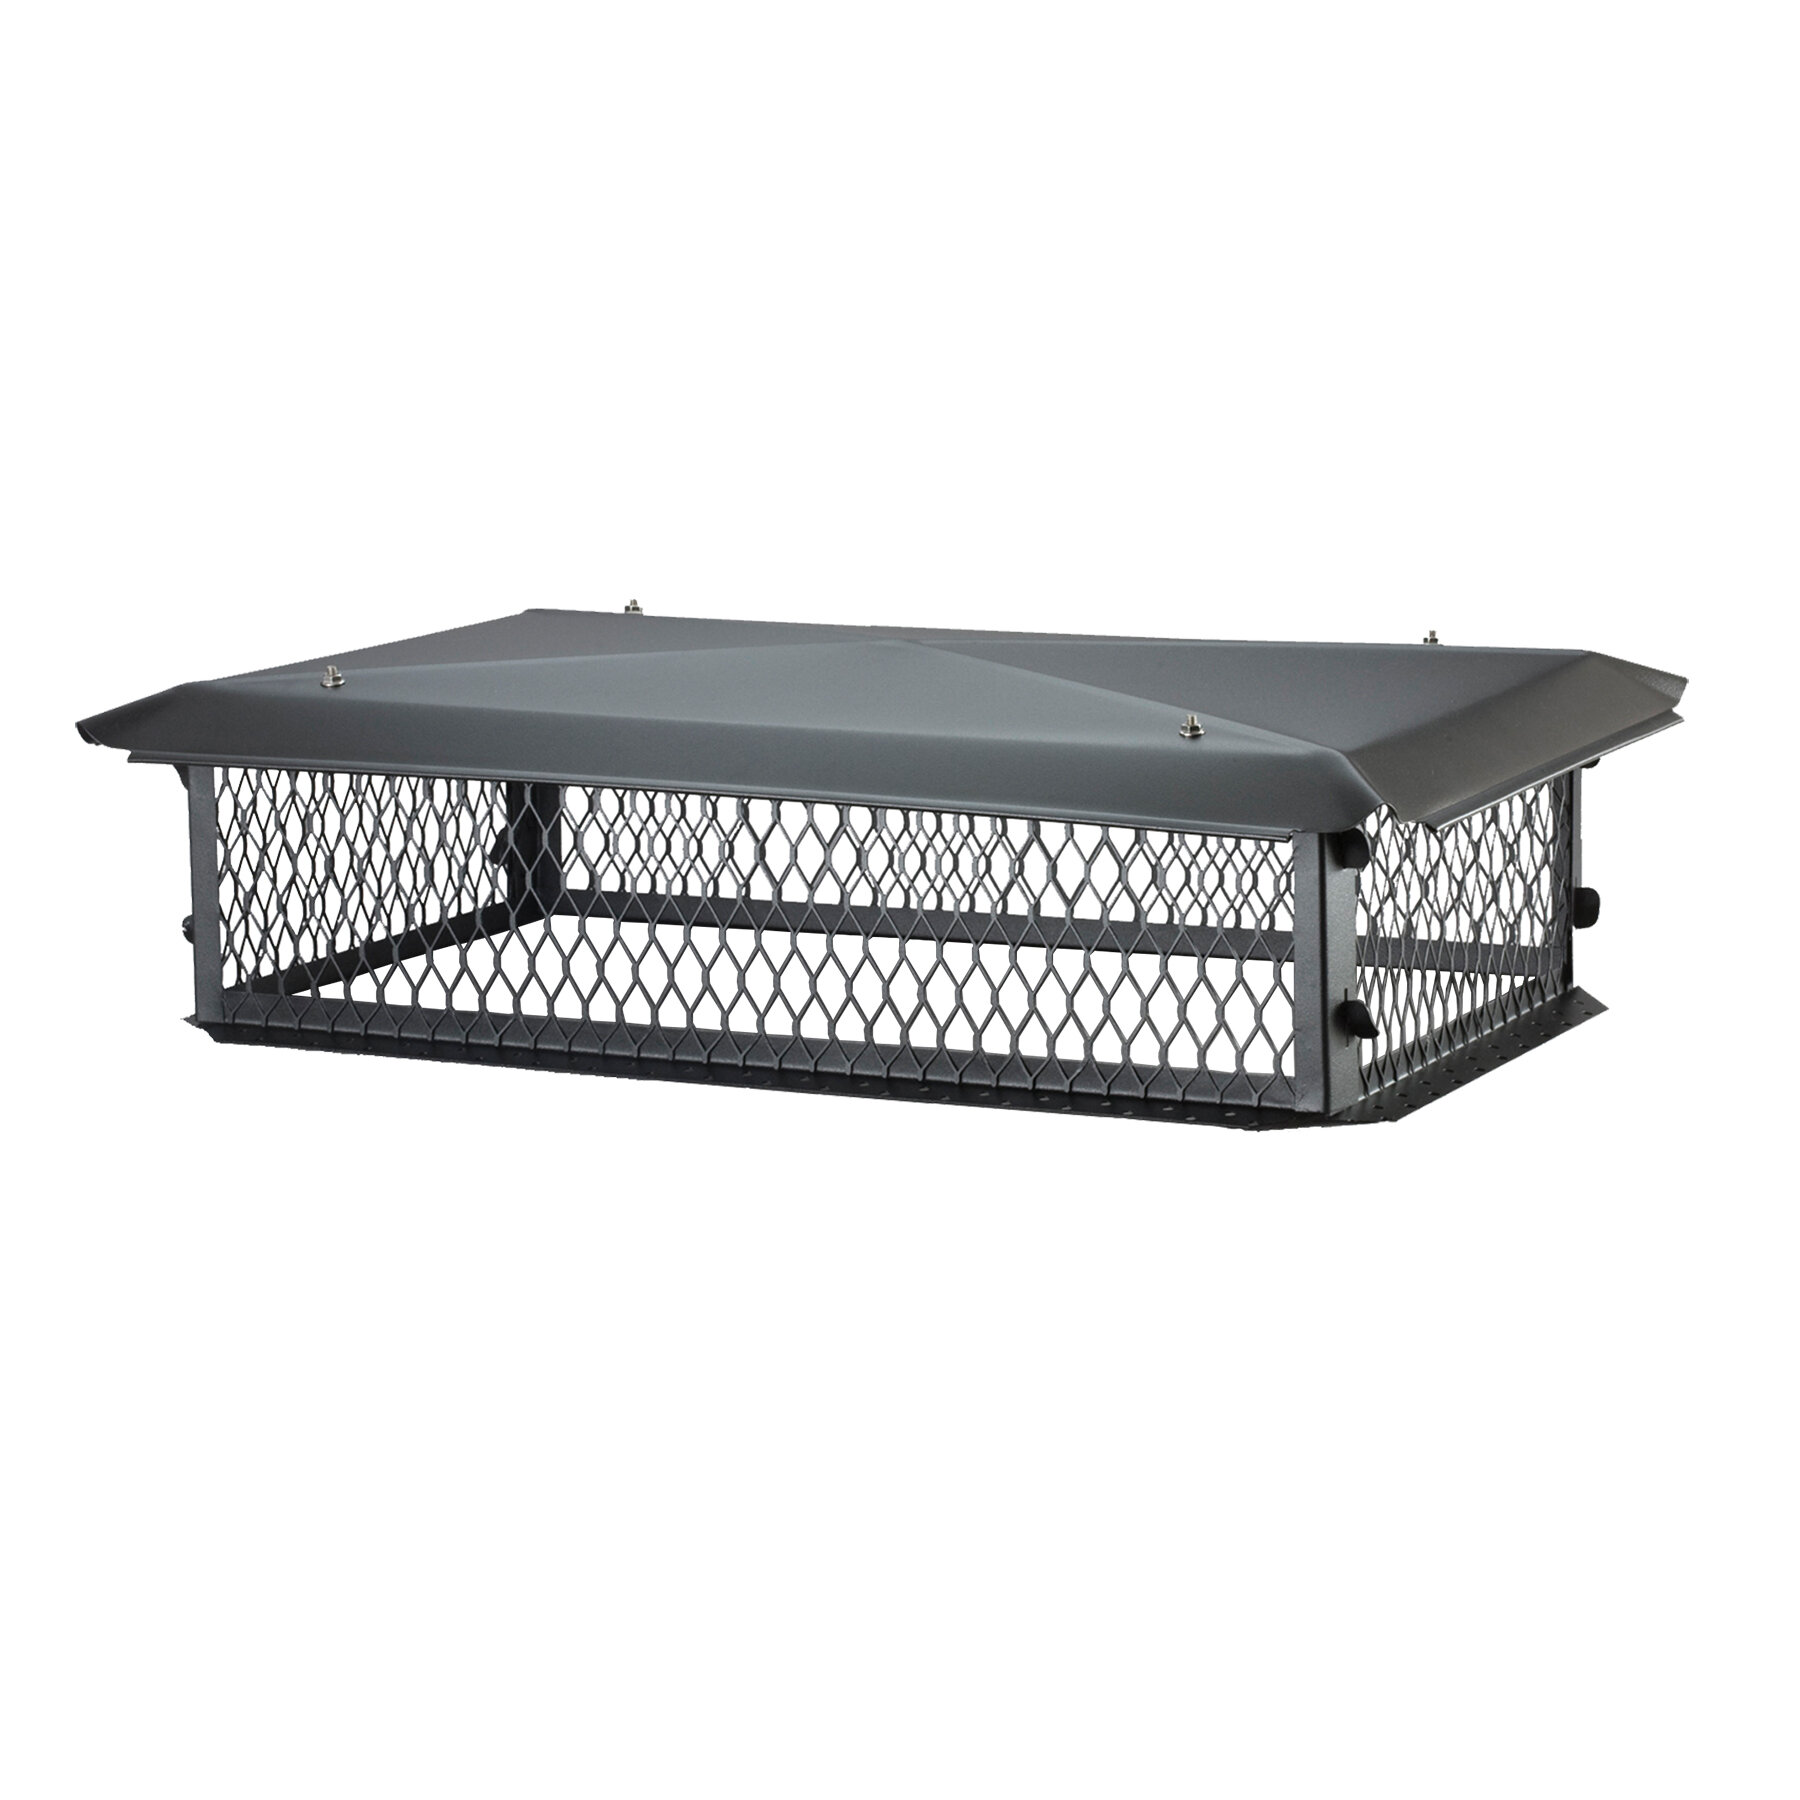 Shelter Galvanized Steel Multi Flue Chimney Cap U0026 Reviews | Wayfair